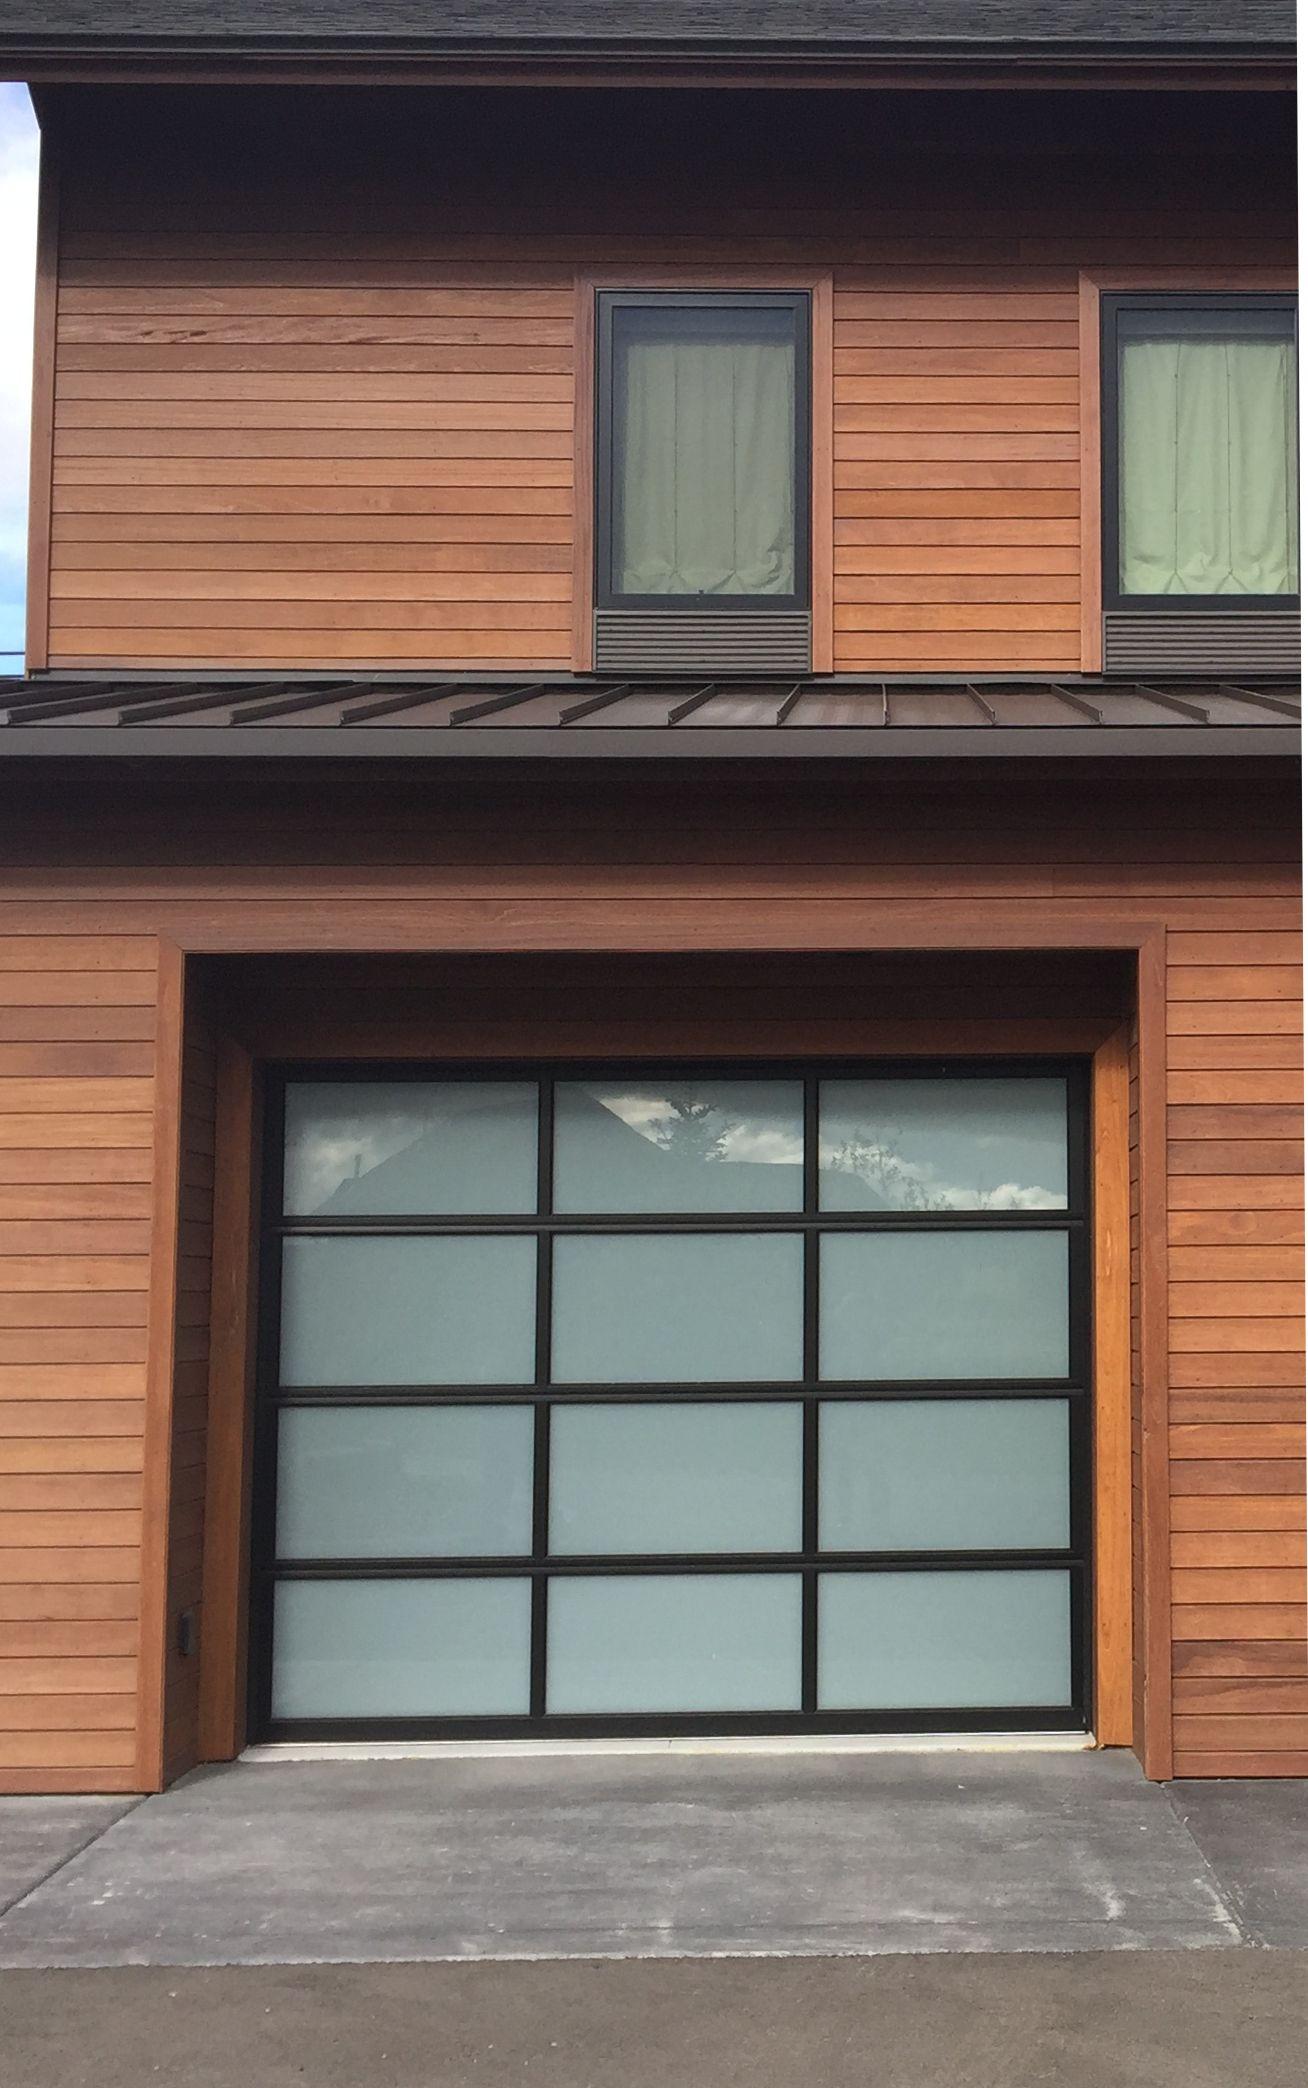 Glass garage door design with batu wood siding provided by nova glass garage door design with batu wood siding provided by nova usa wood mahogany siding rubansaba